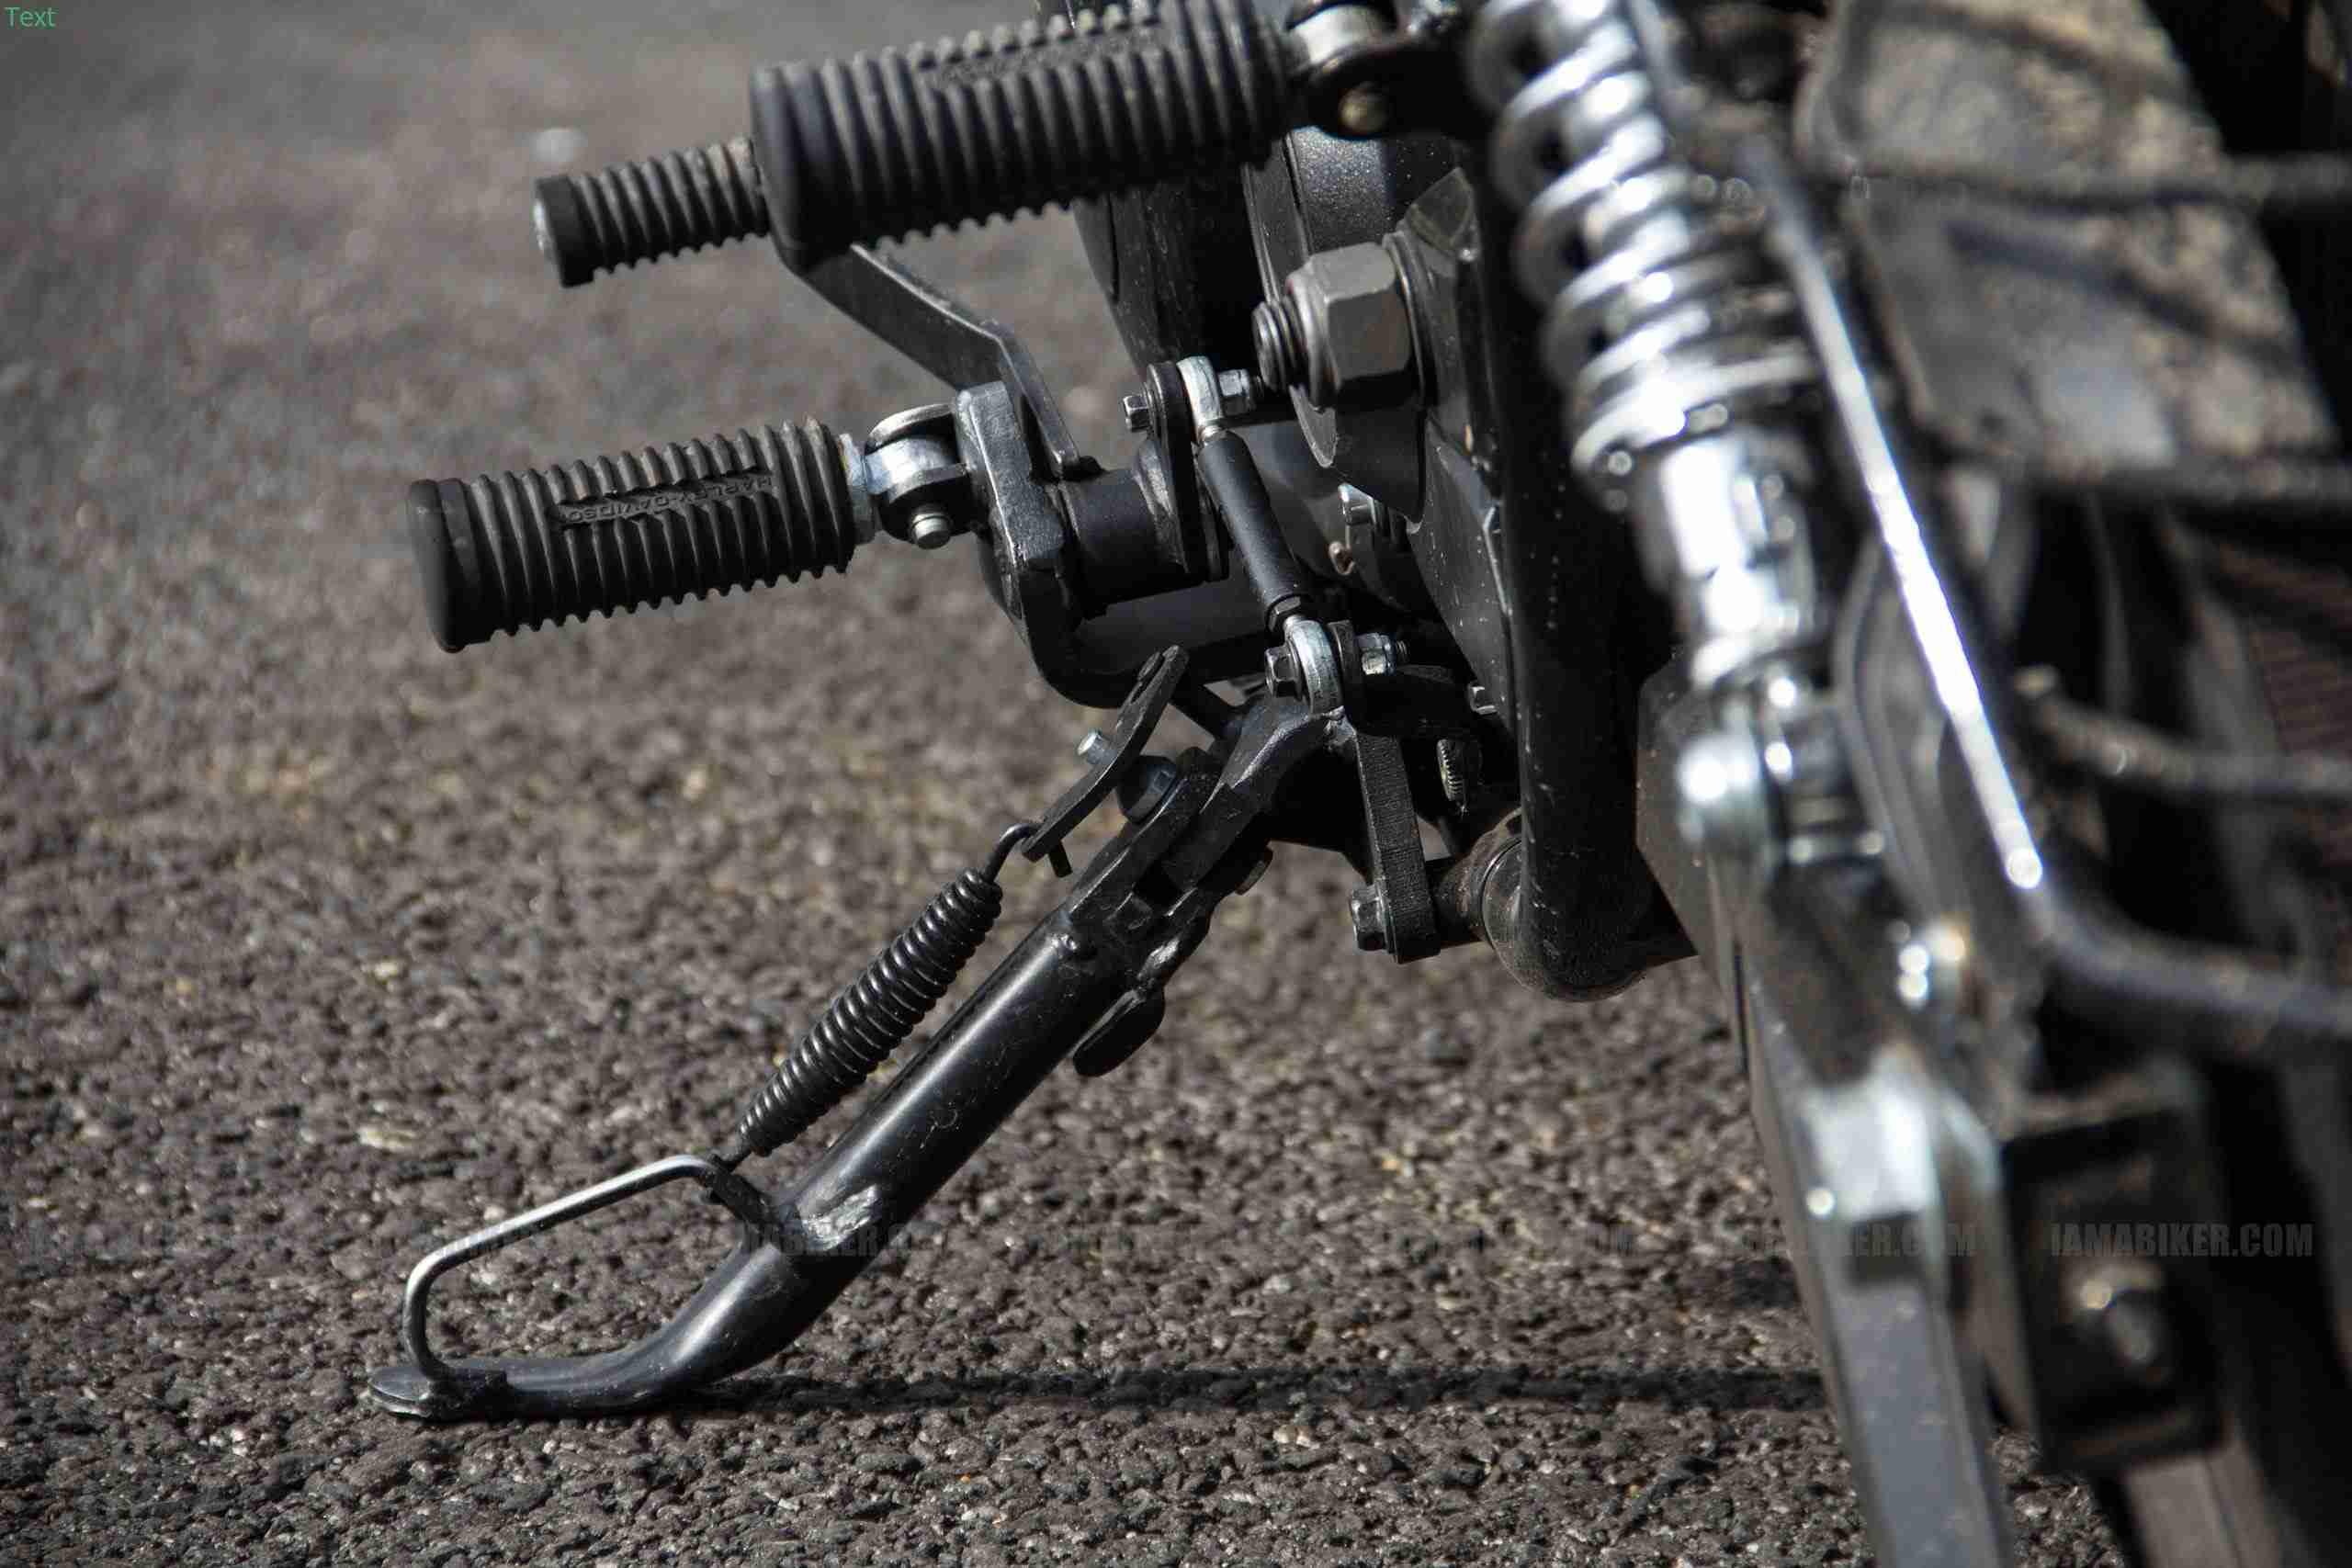 2015 Harley Davidson Street 750 review - 42